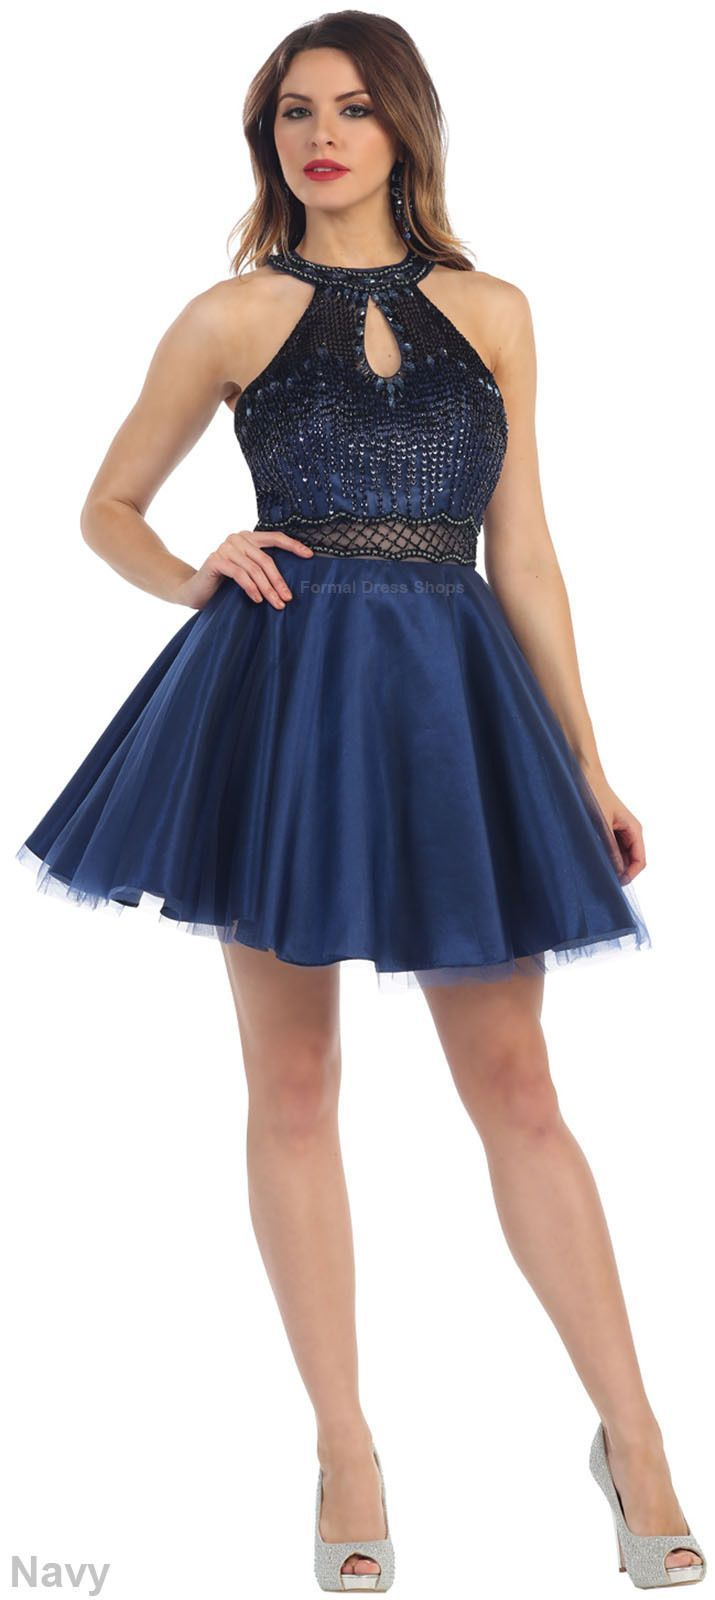 Halter Top Short Sweet 16 Dress Homecoming Semi Formal Prom Dance Birthday Party Sweet 16 Dresses Short Sweet 16 Dresses Homecoming Dresses [ 1600 x 715 Pixel ]